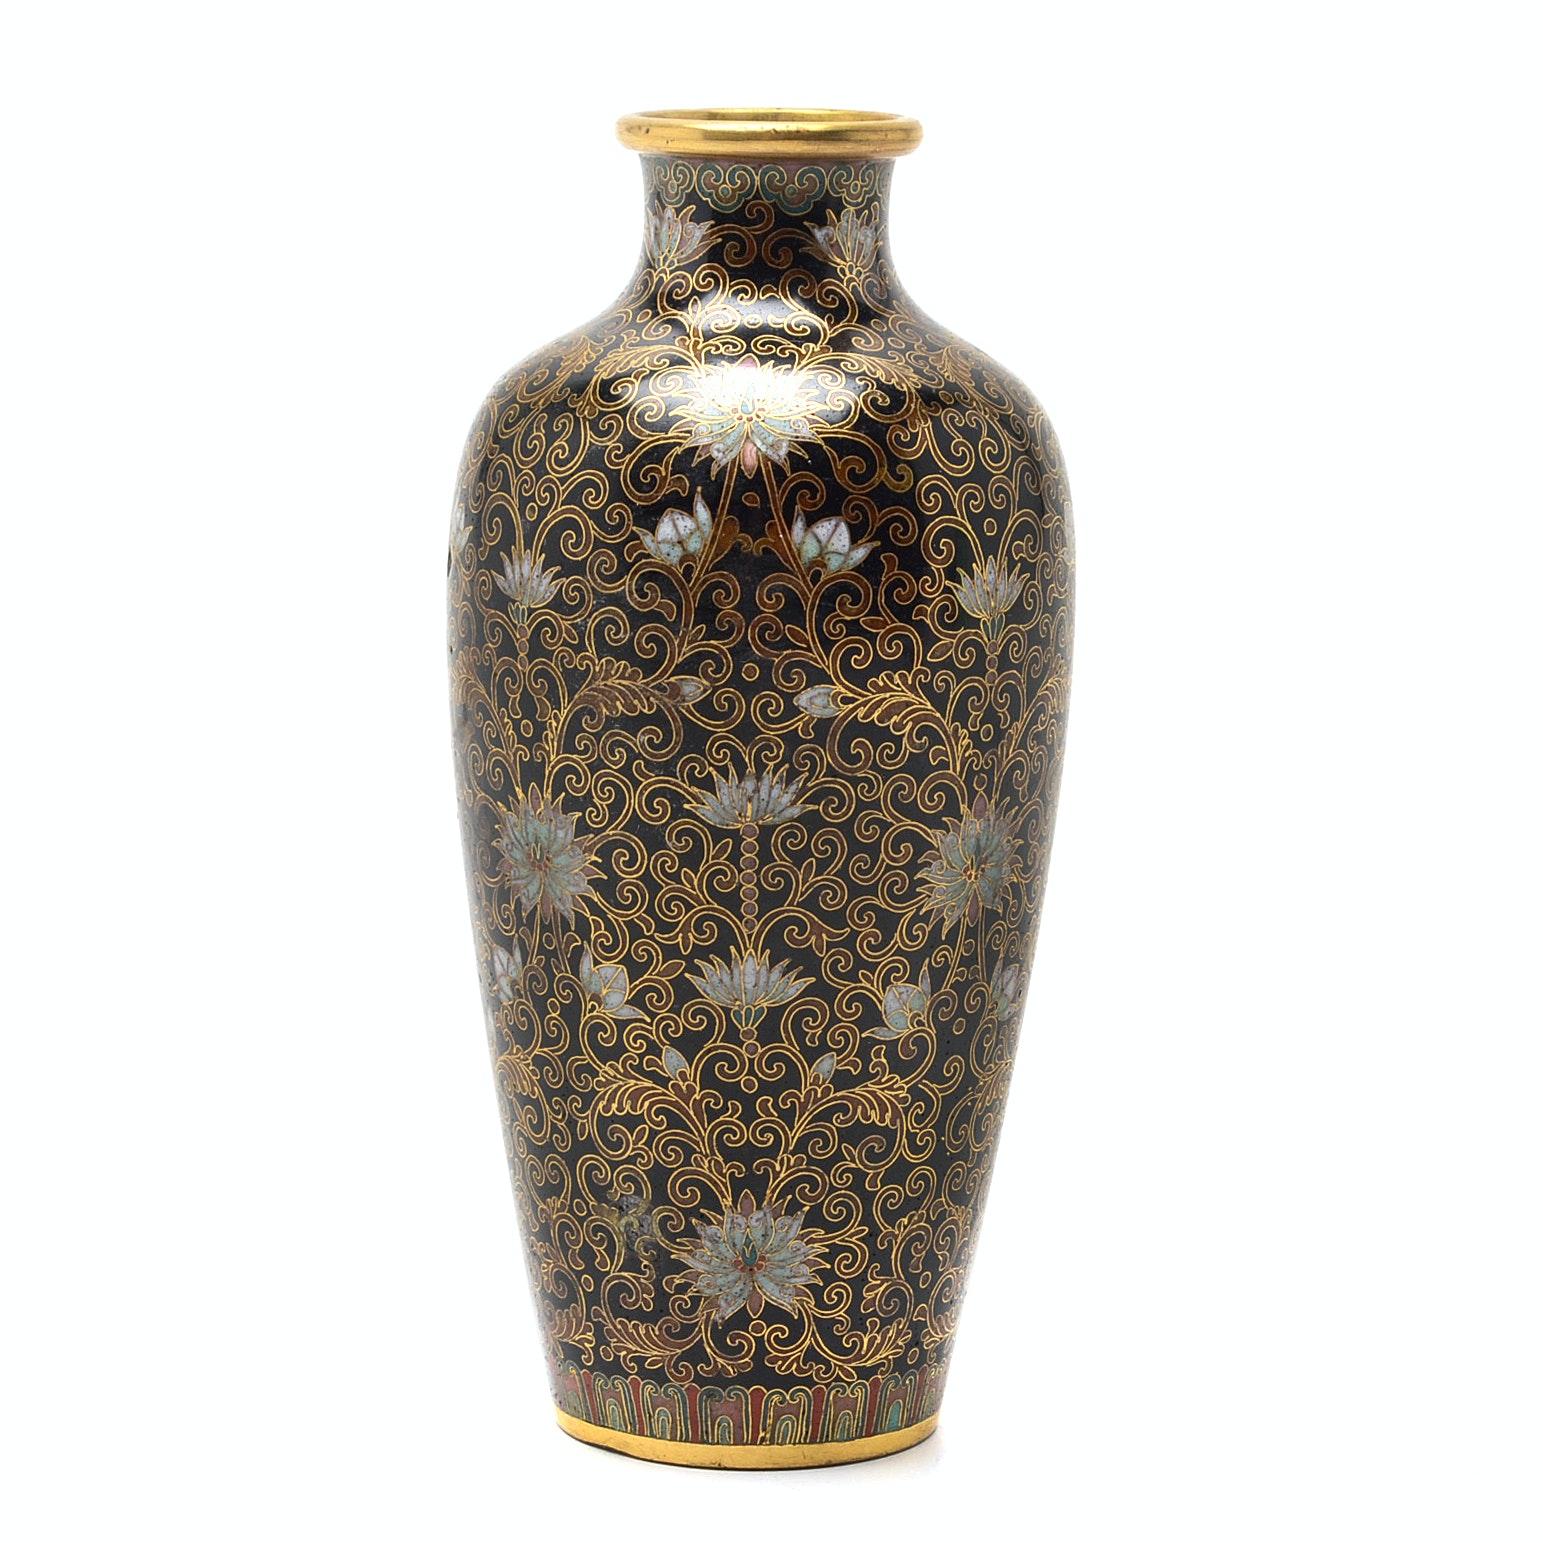 Meiji Era Japanese Cloisonné Brass Vase